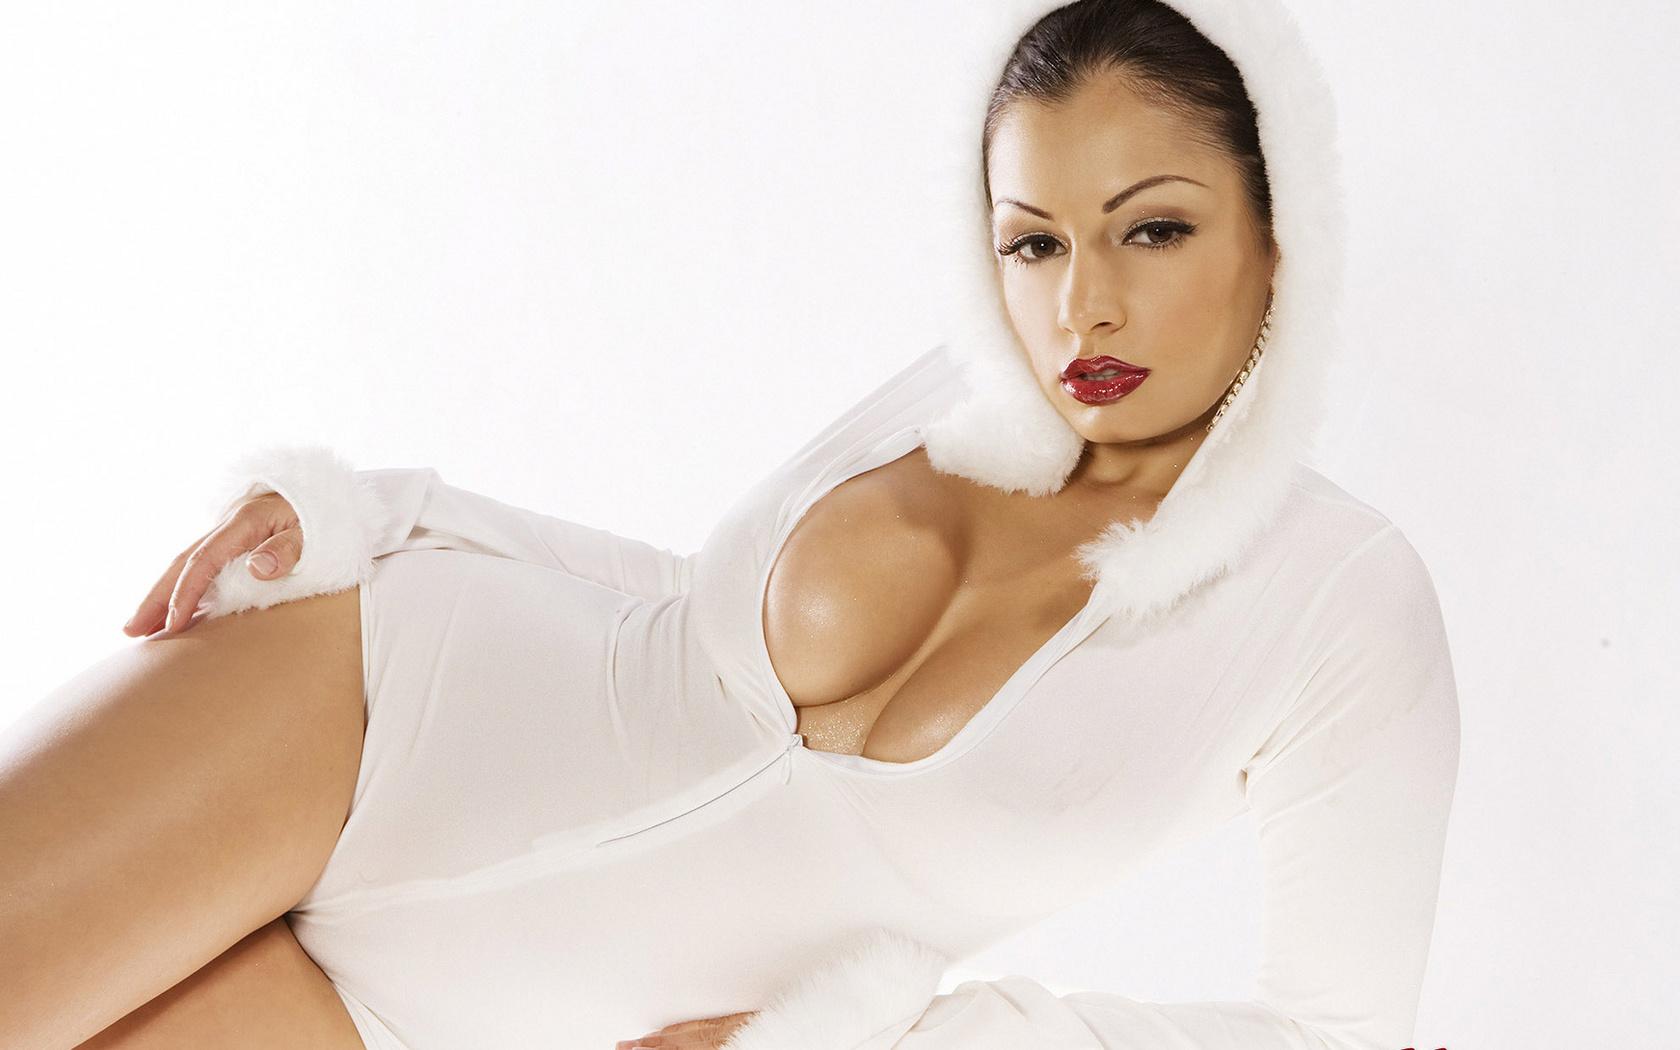 Фото ариа джовани, Aria Giovanni - все порно и секс фото модели 1 фотография